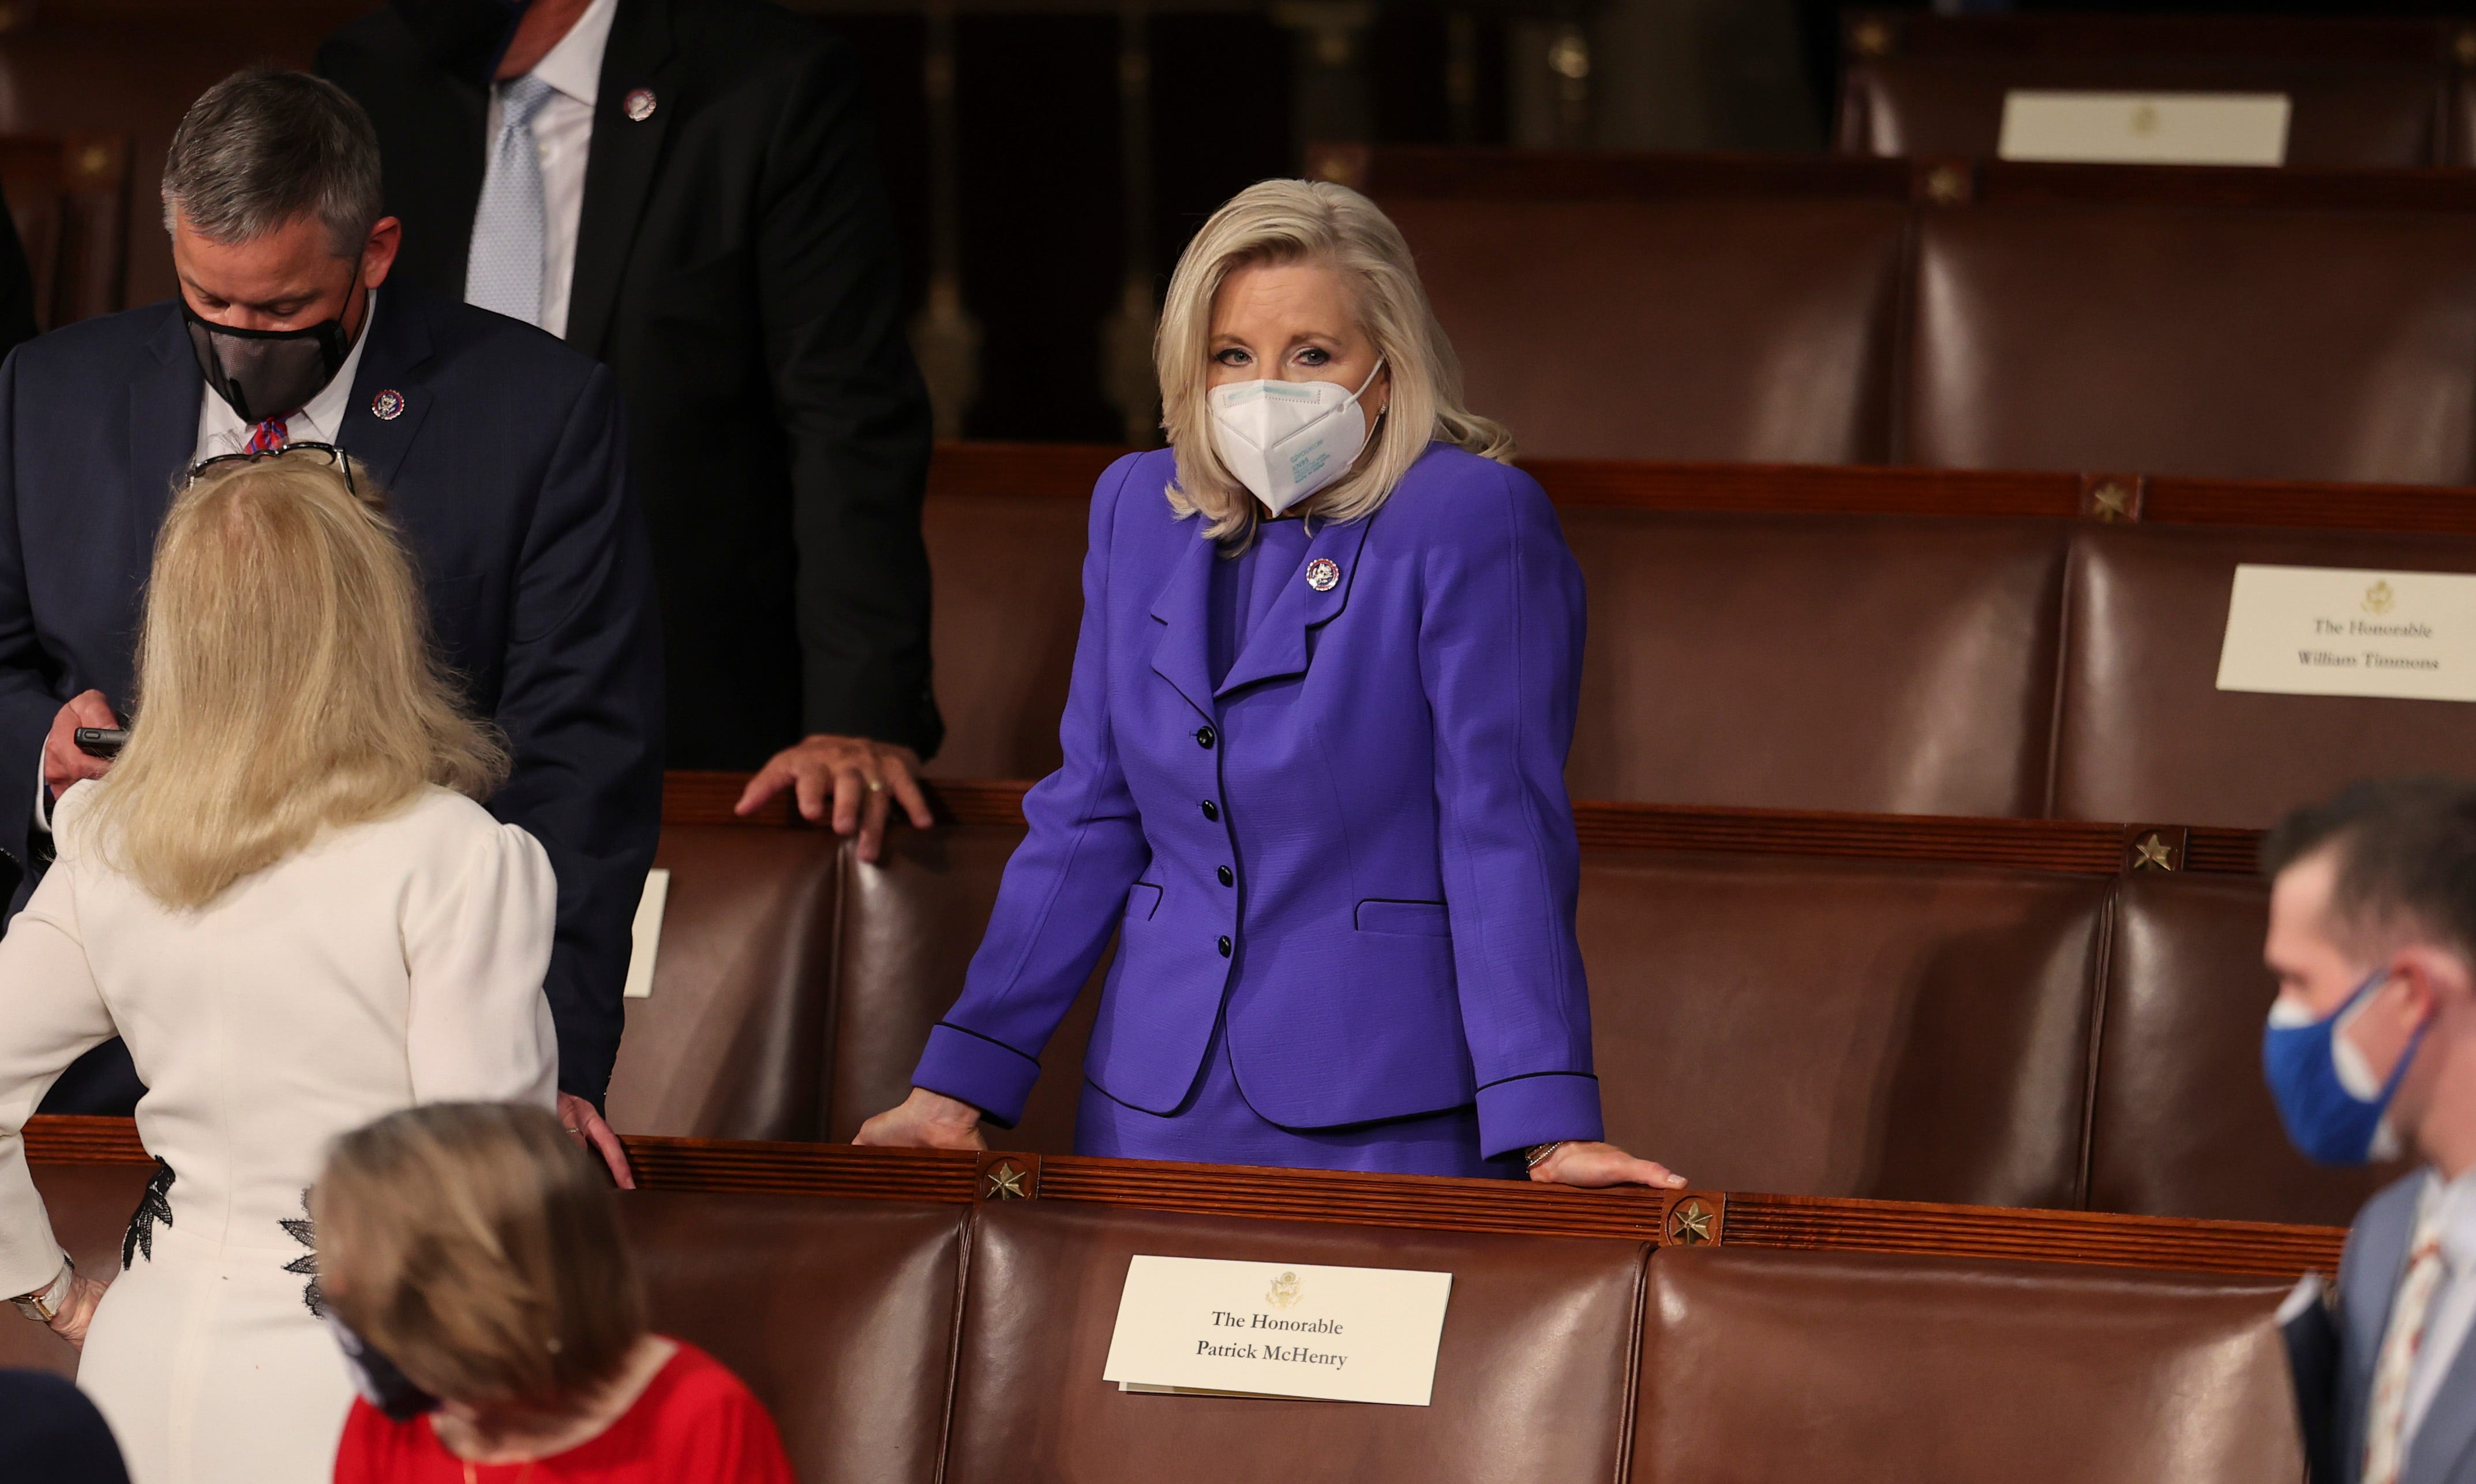 GOP Sen. Mitt Romney defends Rep. Liz Cheney amid Republican blowback:  Liz Cheney refuses to lie